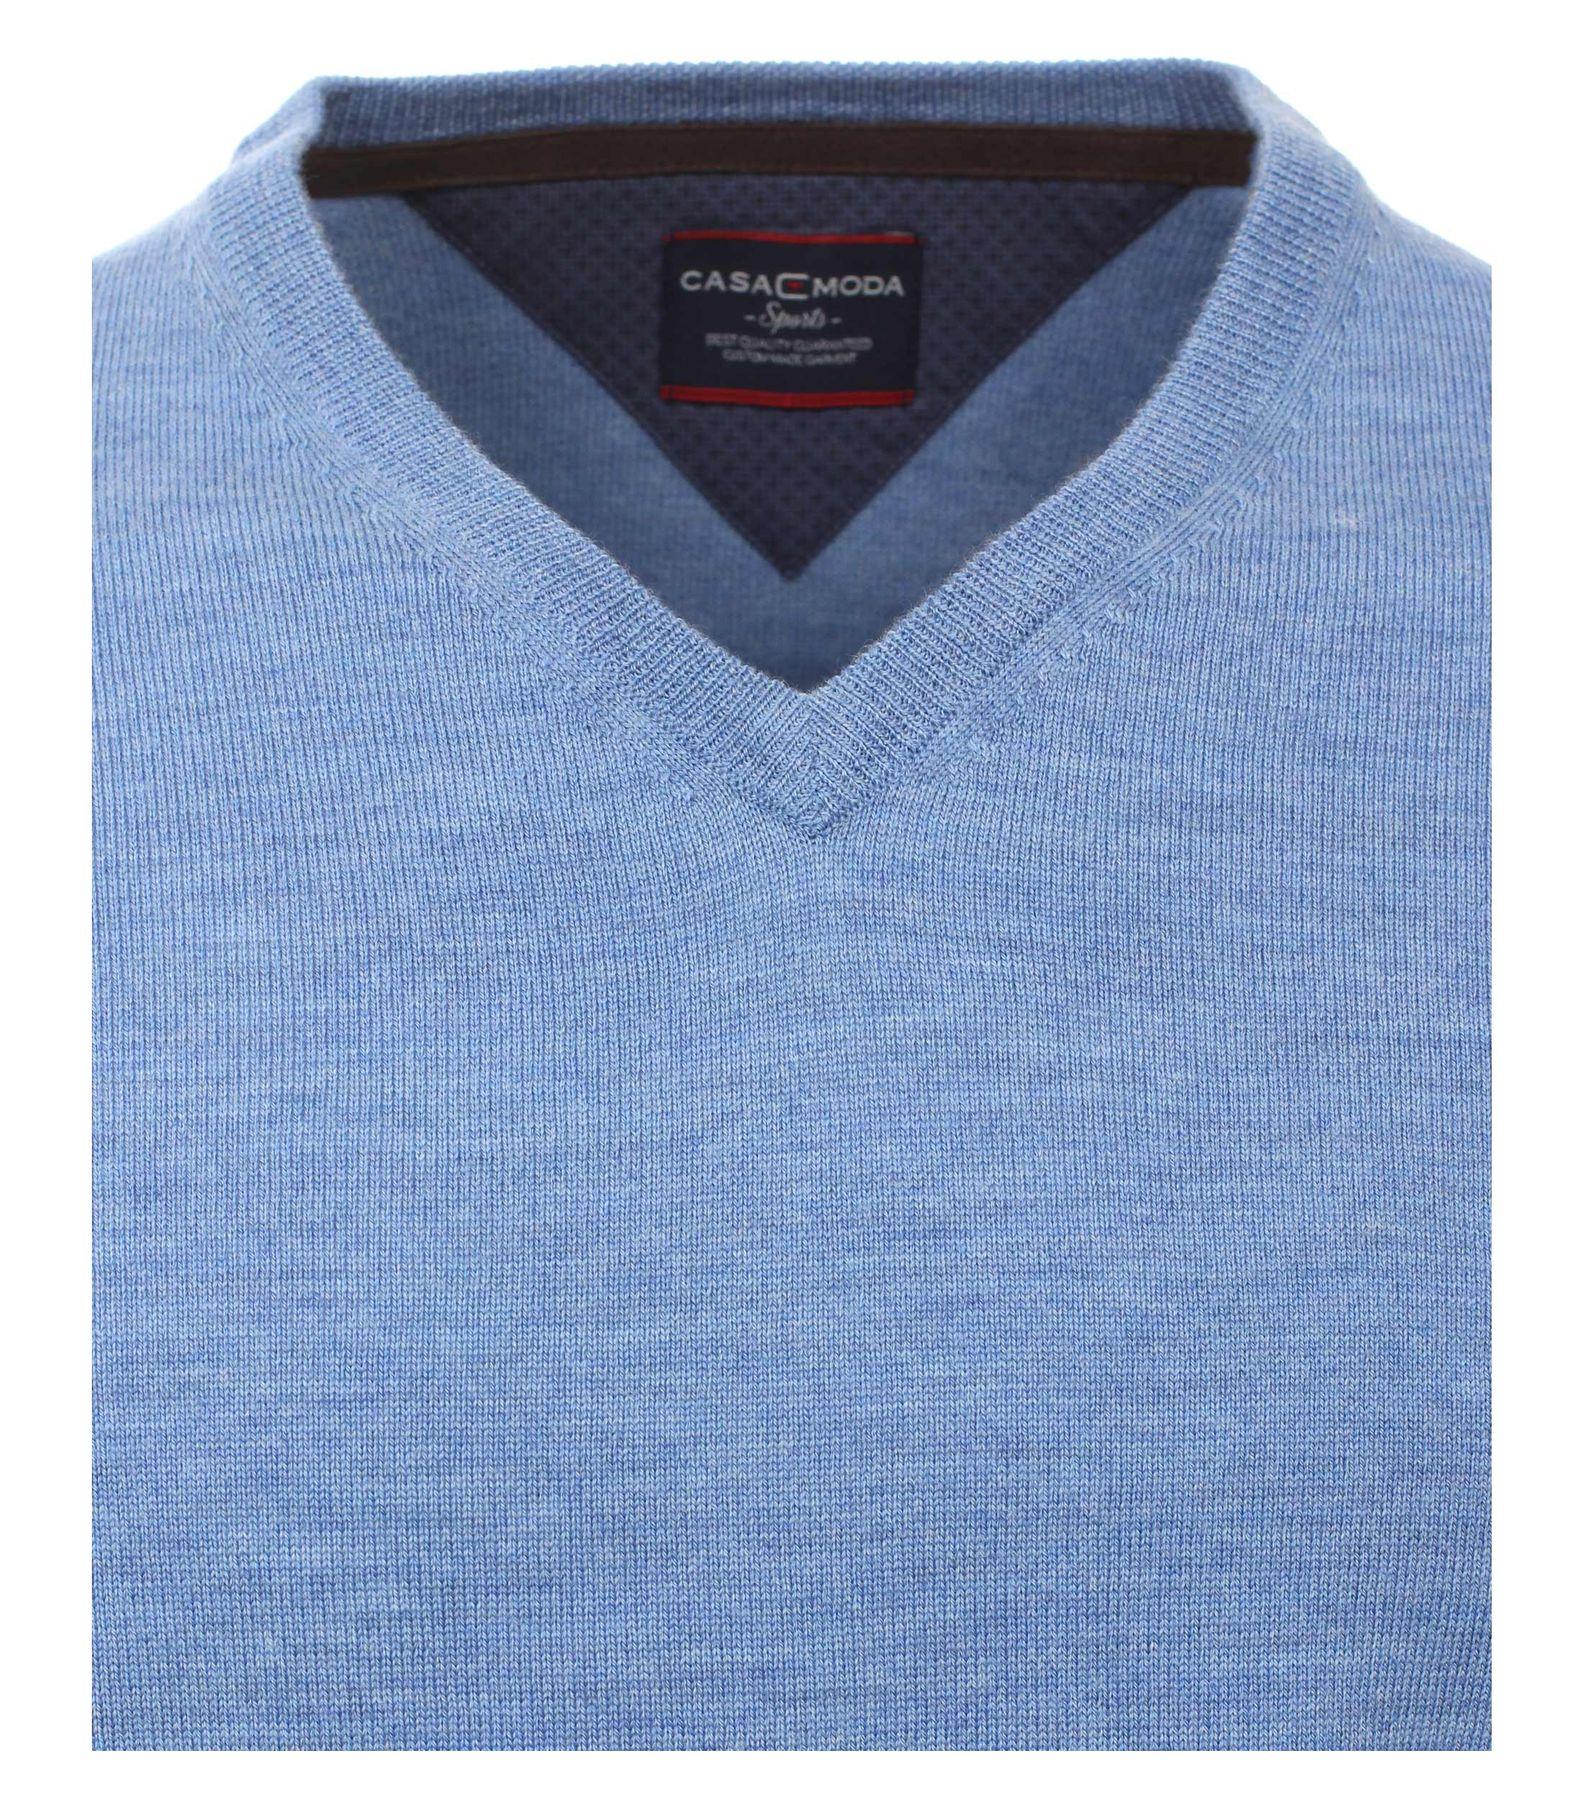 Casa Moda - Herren Merino Pullover mit V-Ausschnitt (462519900) – Bild 4